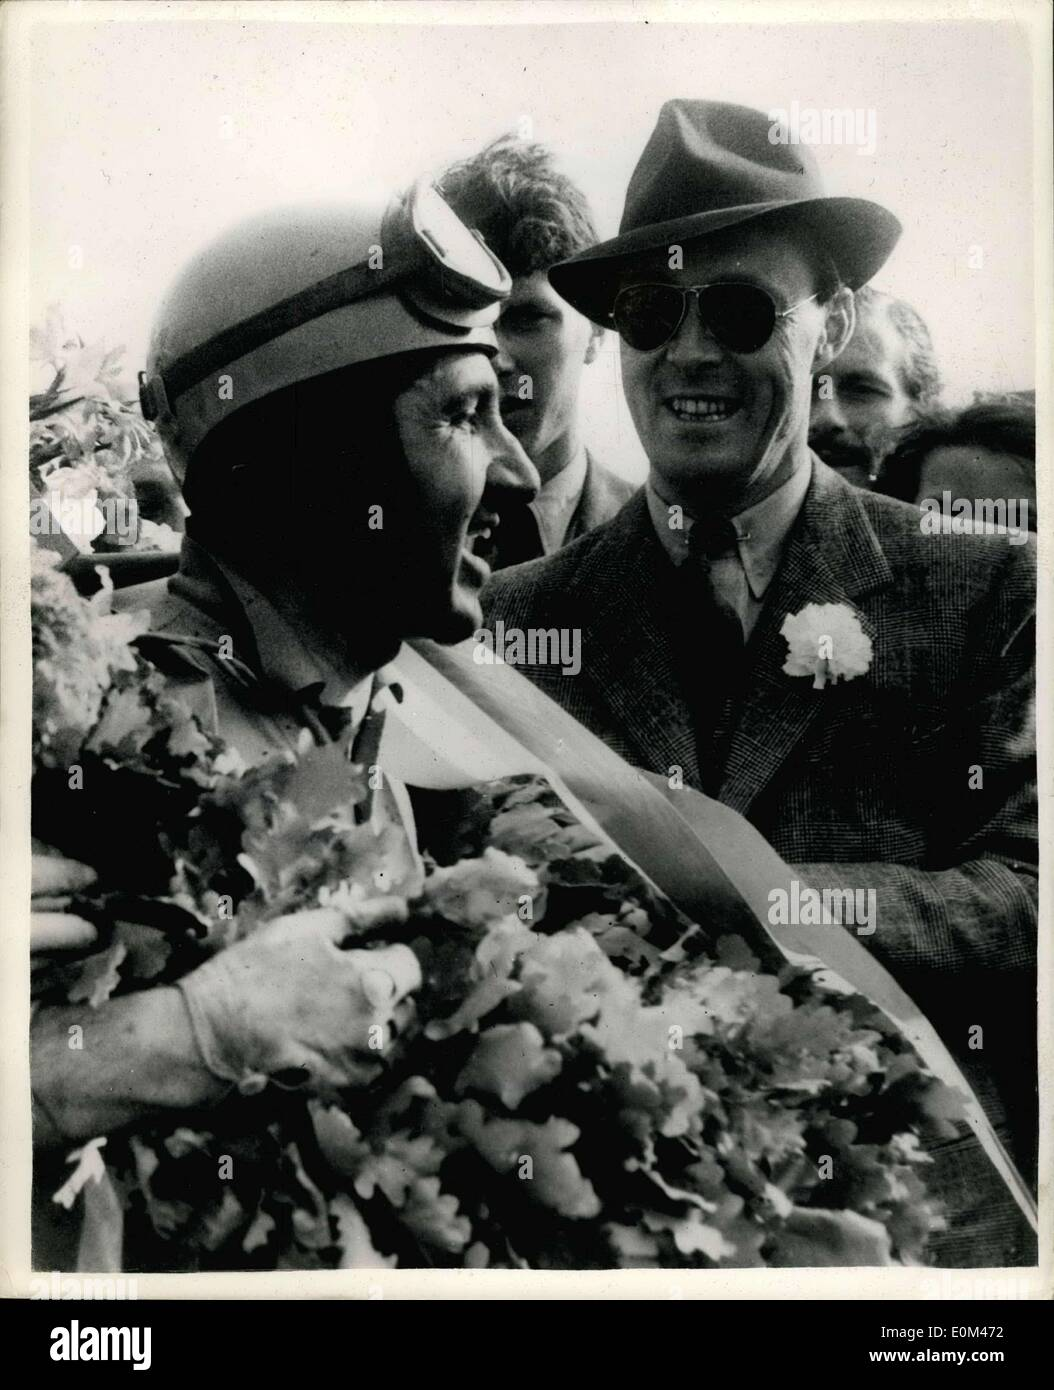 Jun. 09, 1953 - Prince Bernhard of the Netherlands Congratulates Ascari - Winner of the Granprix.: Prince Bernhard of the Netherlands congratulates Ascari - after the latter had won the Gran Prix of the Netherlands on the Circuit of Zandvcort. Holland. Stock Photo